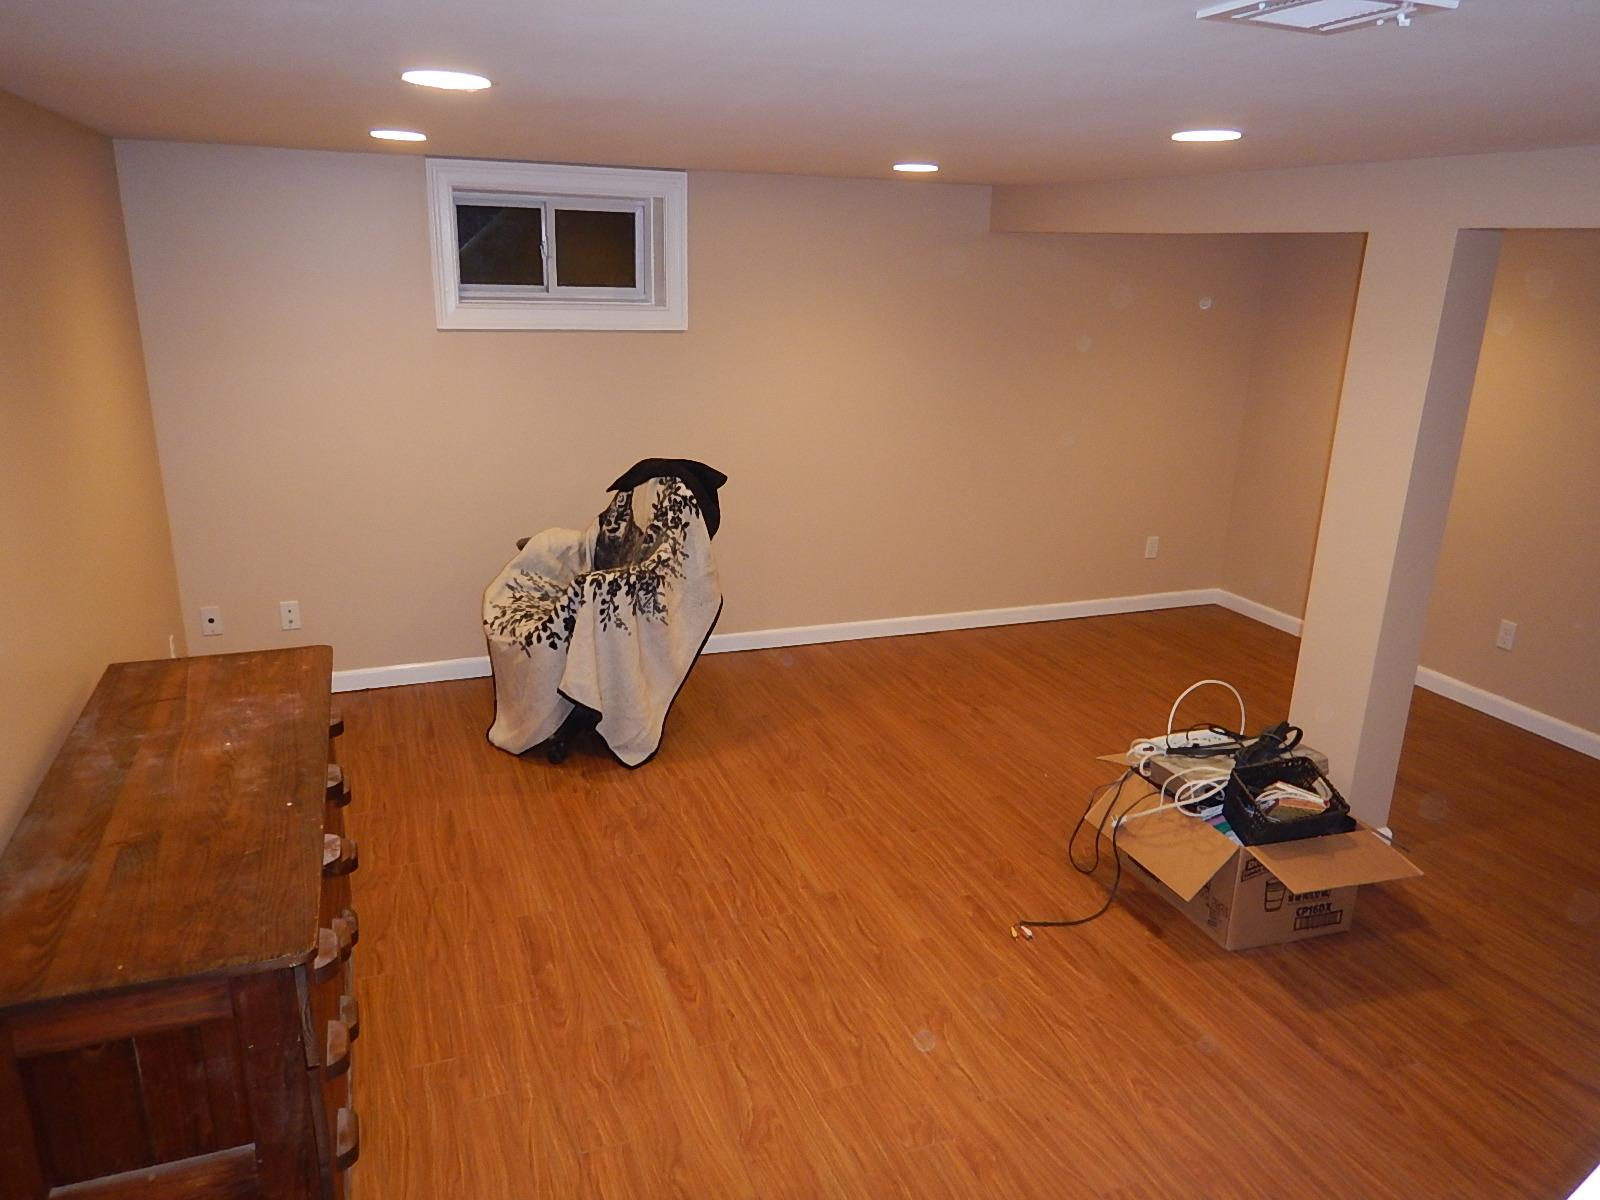 Elite Plank Flooring Installation in Stratford, CT - After Photo